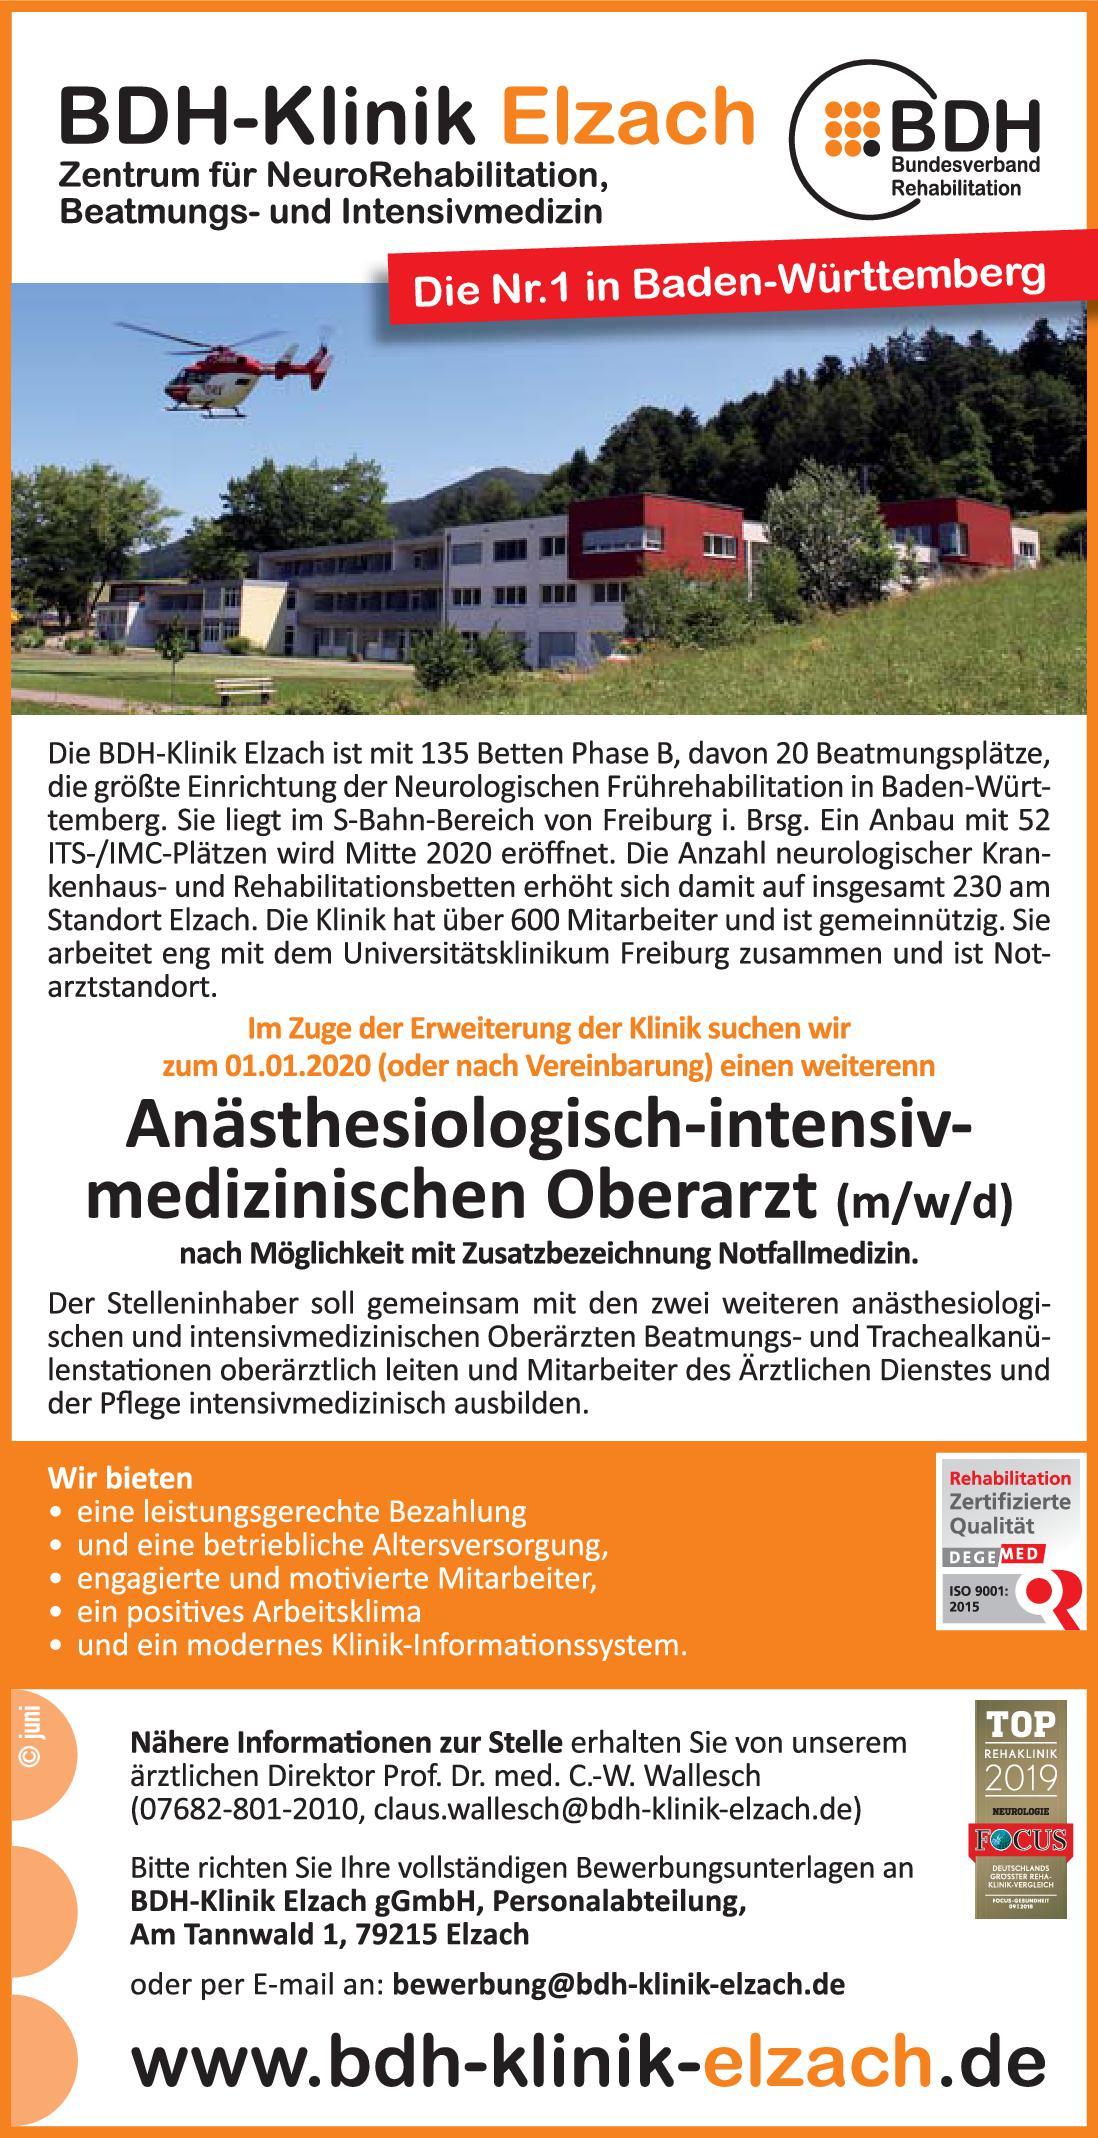 BDH-Klinik Elzach Anästhesiologisch-intensivmedizinischer Oberarzt (m/w/d) Anästhesiologie / Intensivmedizin Oberarzt